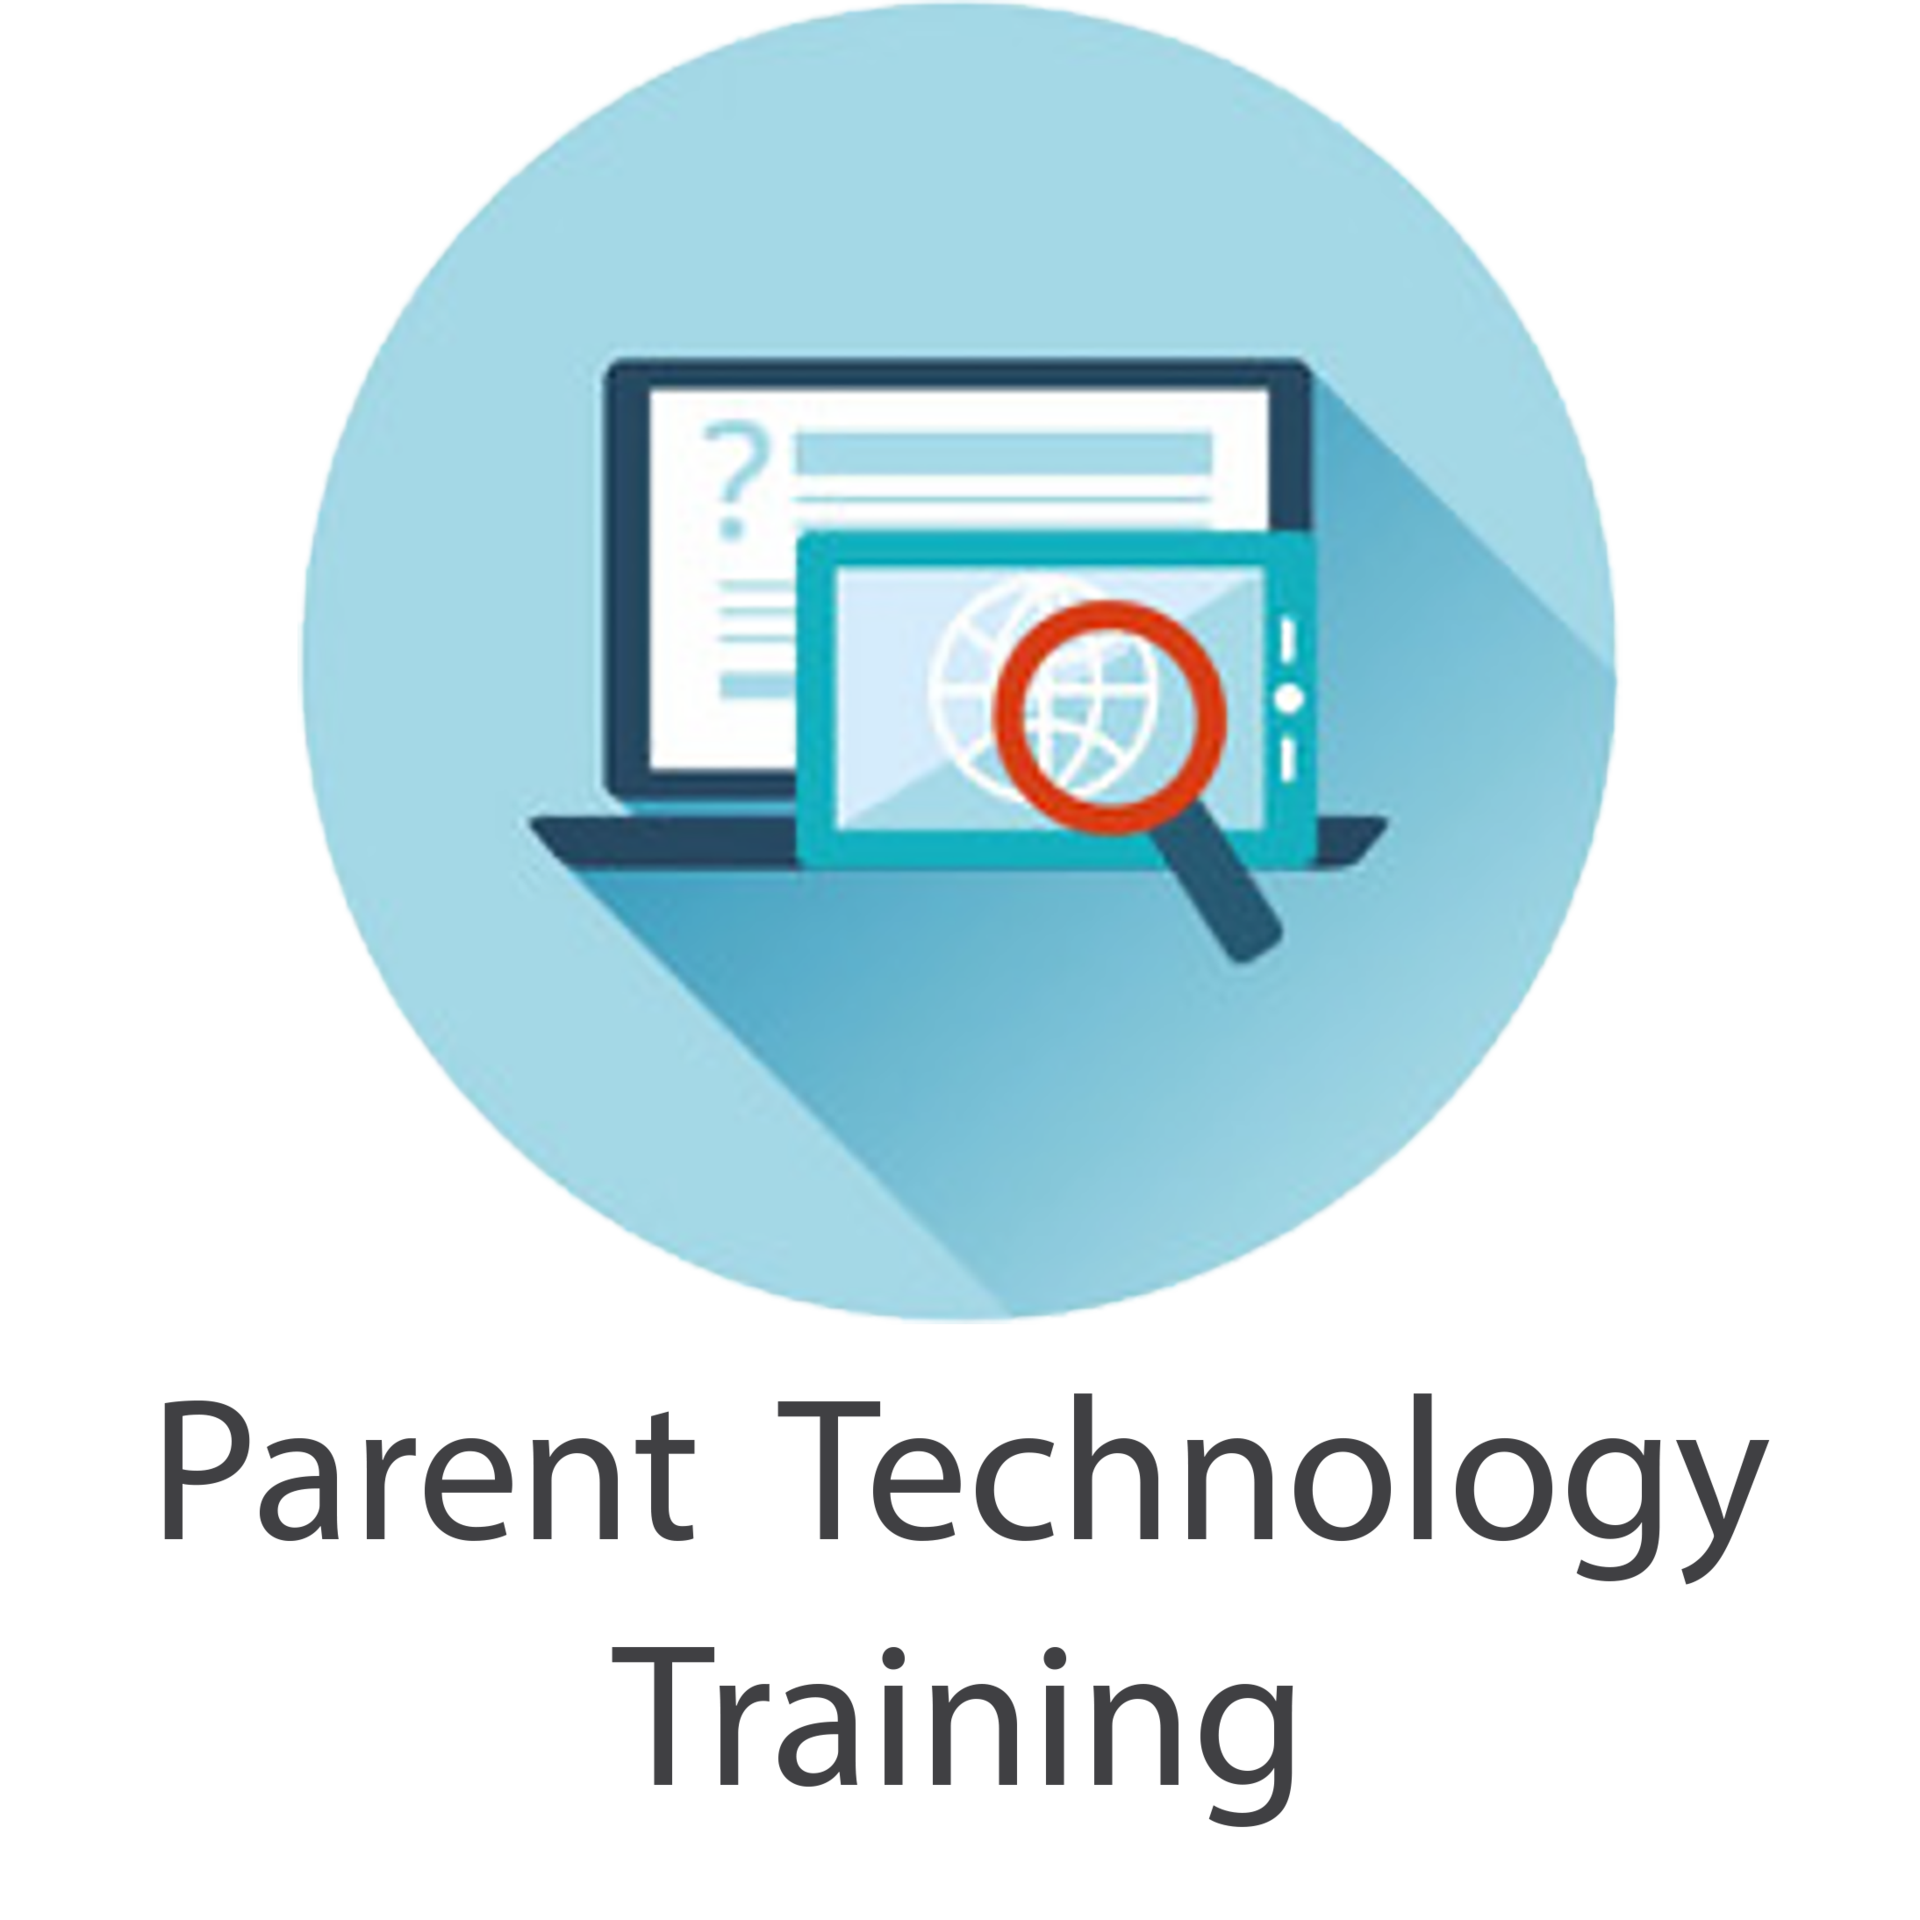 Parent Technology Training